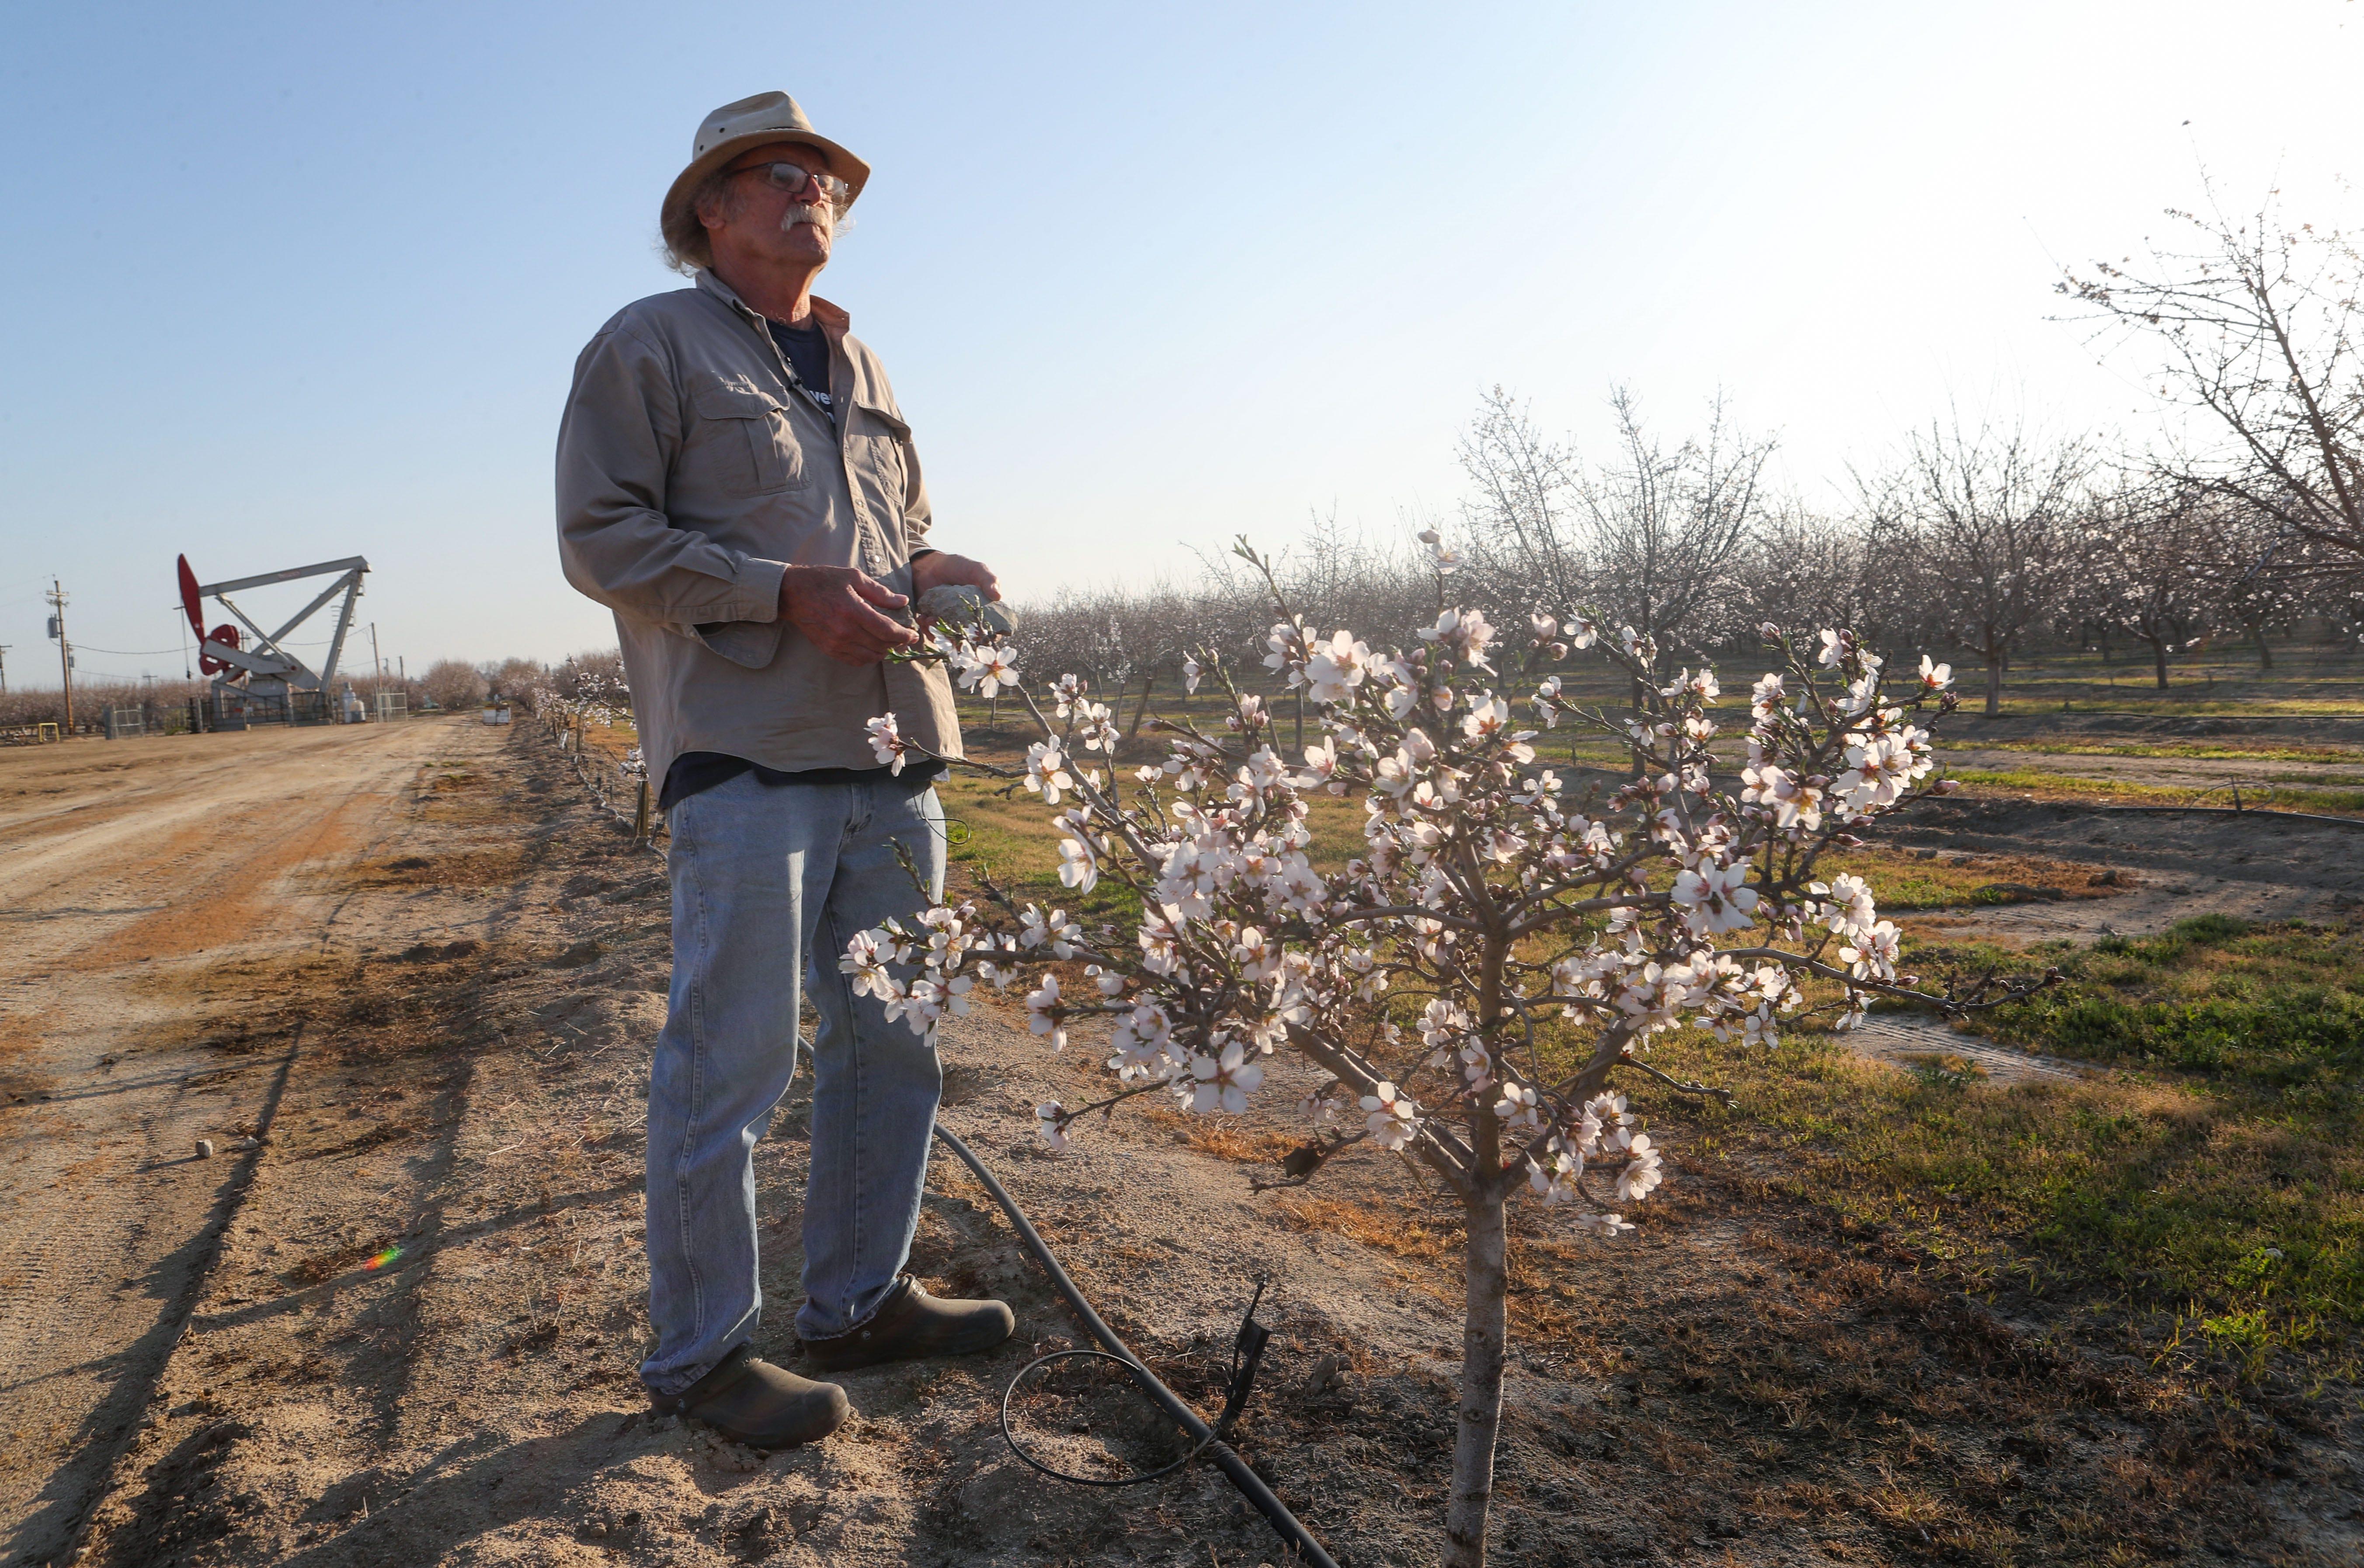 Fourth-generation farmer Tom Frantz says oil waste has stunted a neighbor's almond trees.